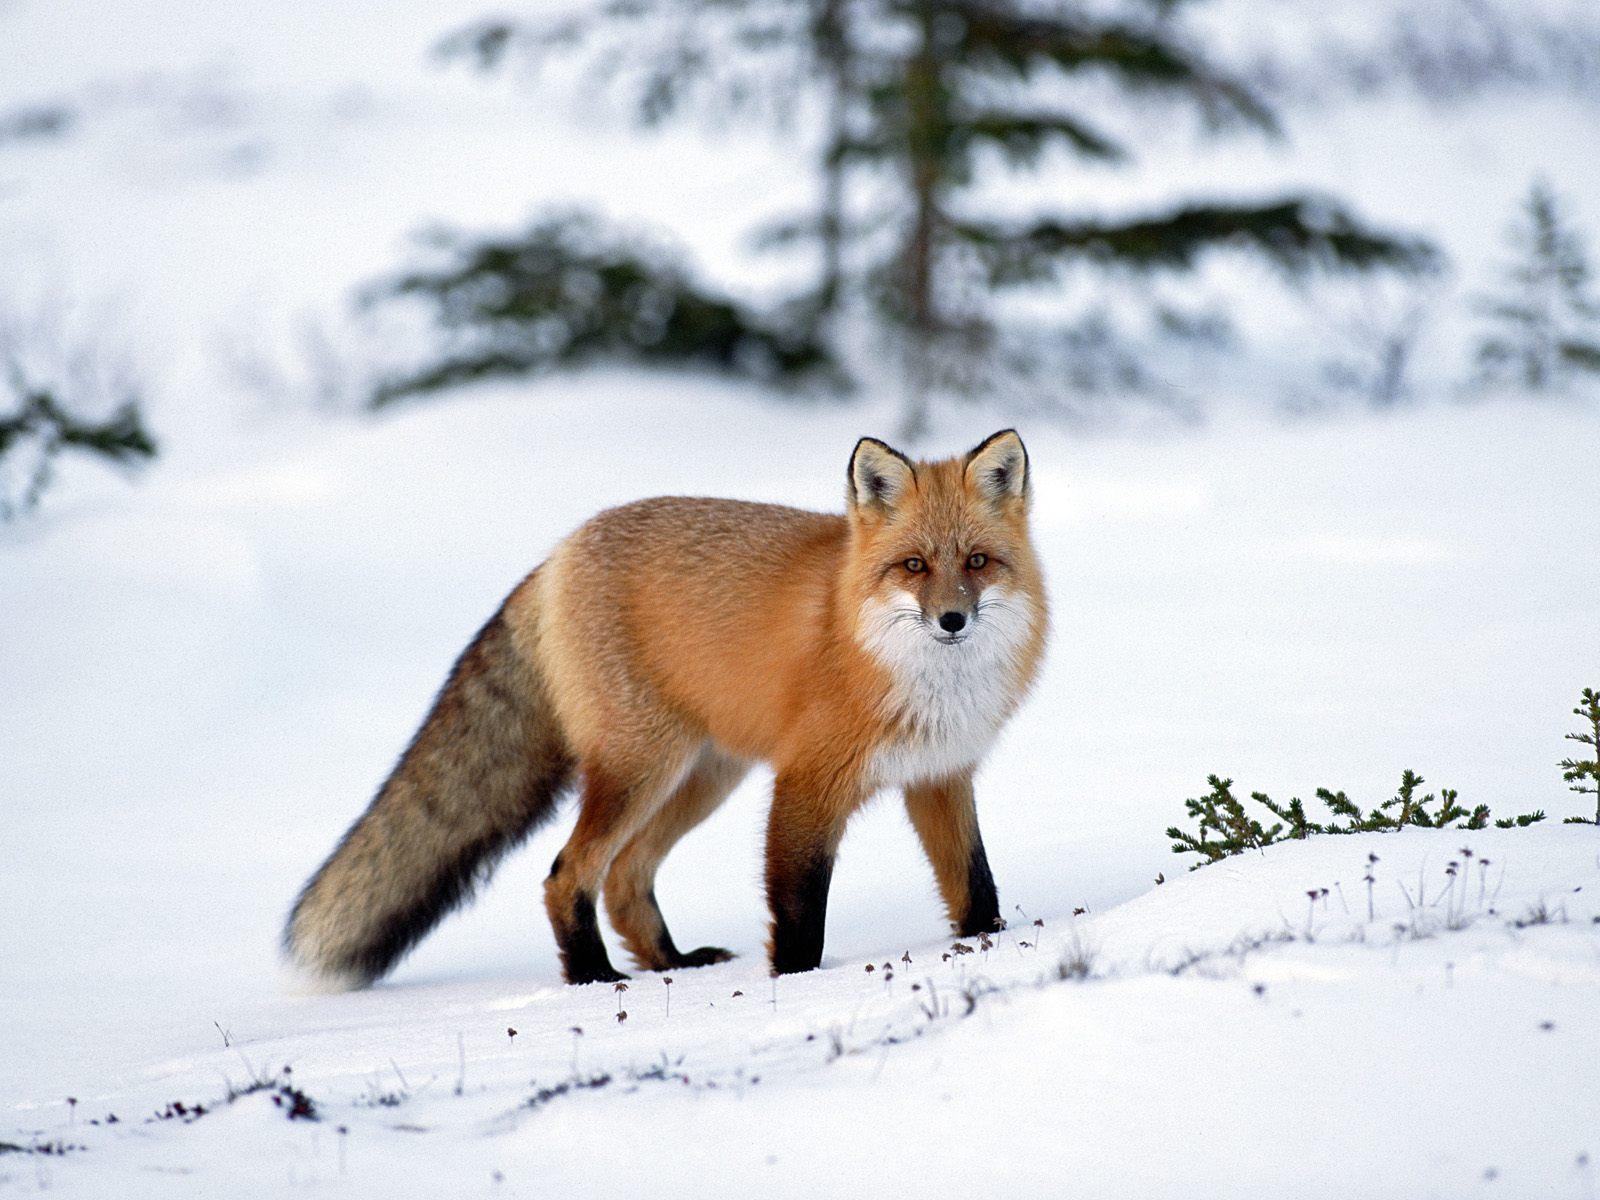 fox wallpaper fox wallpaper 24577448 fanpop